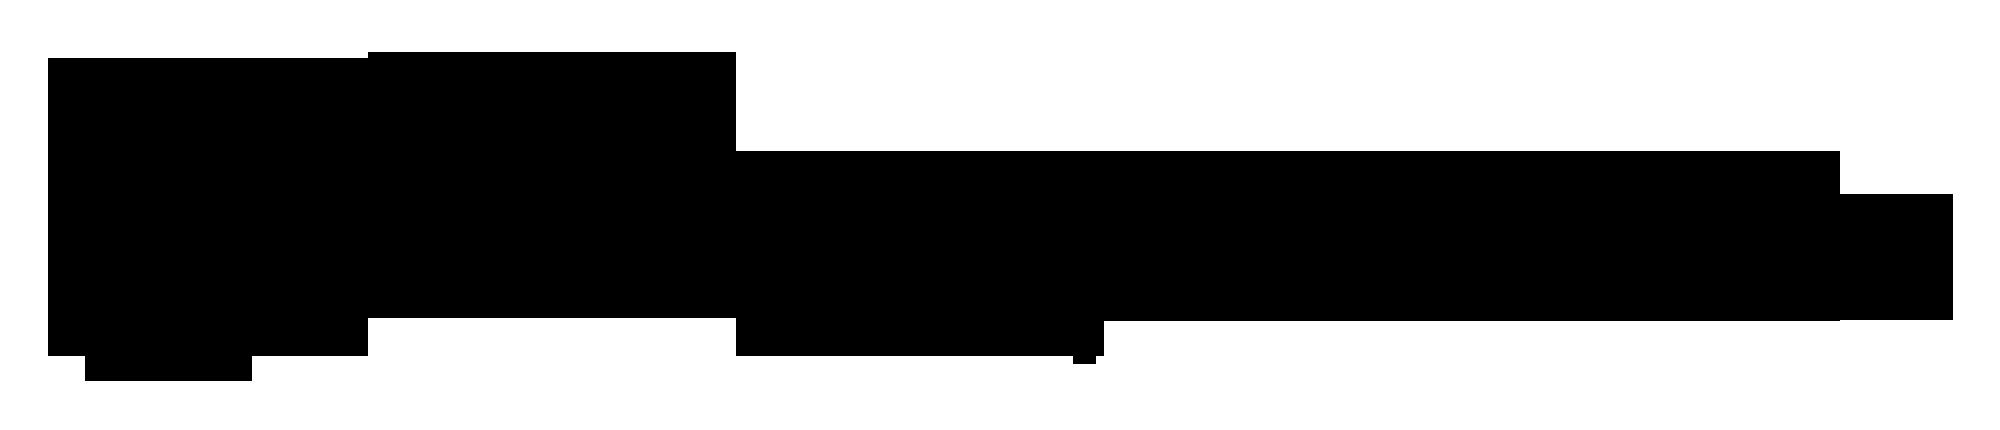 SleepTechne Co., Ltd.